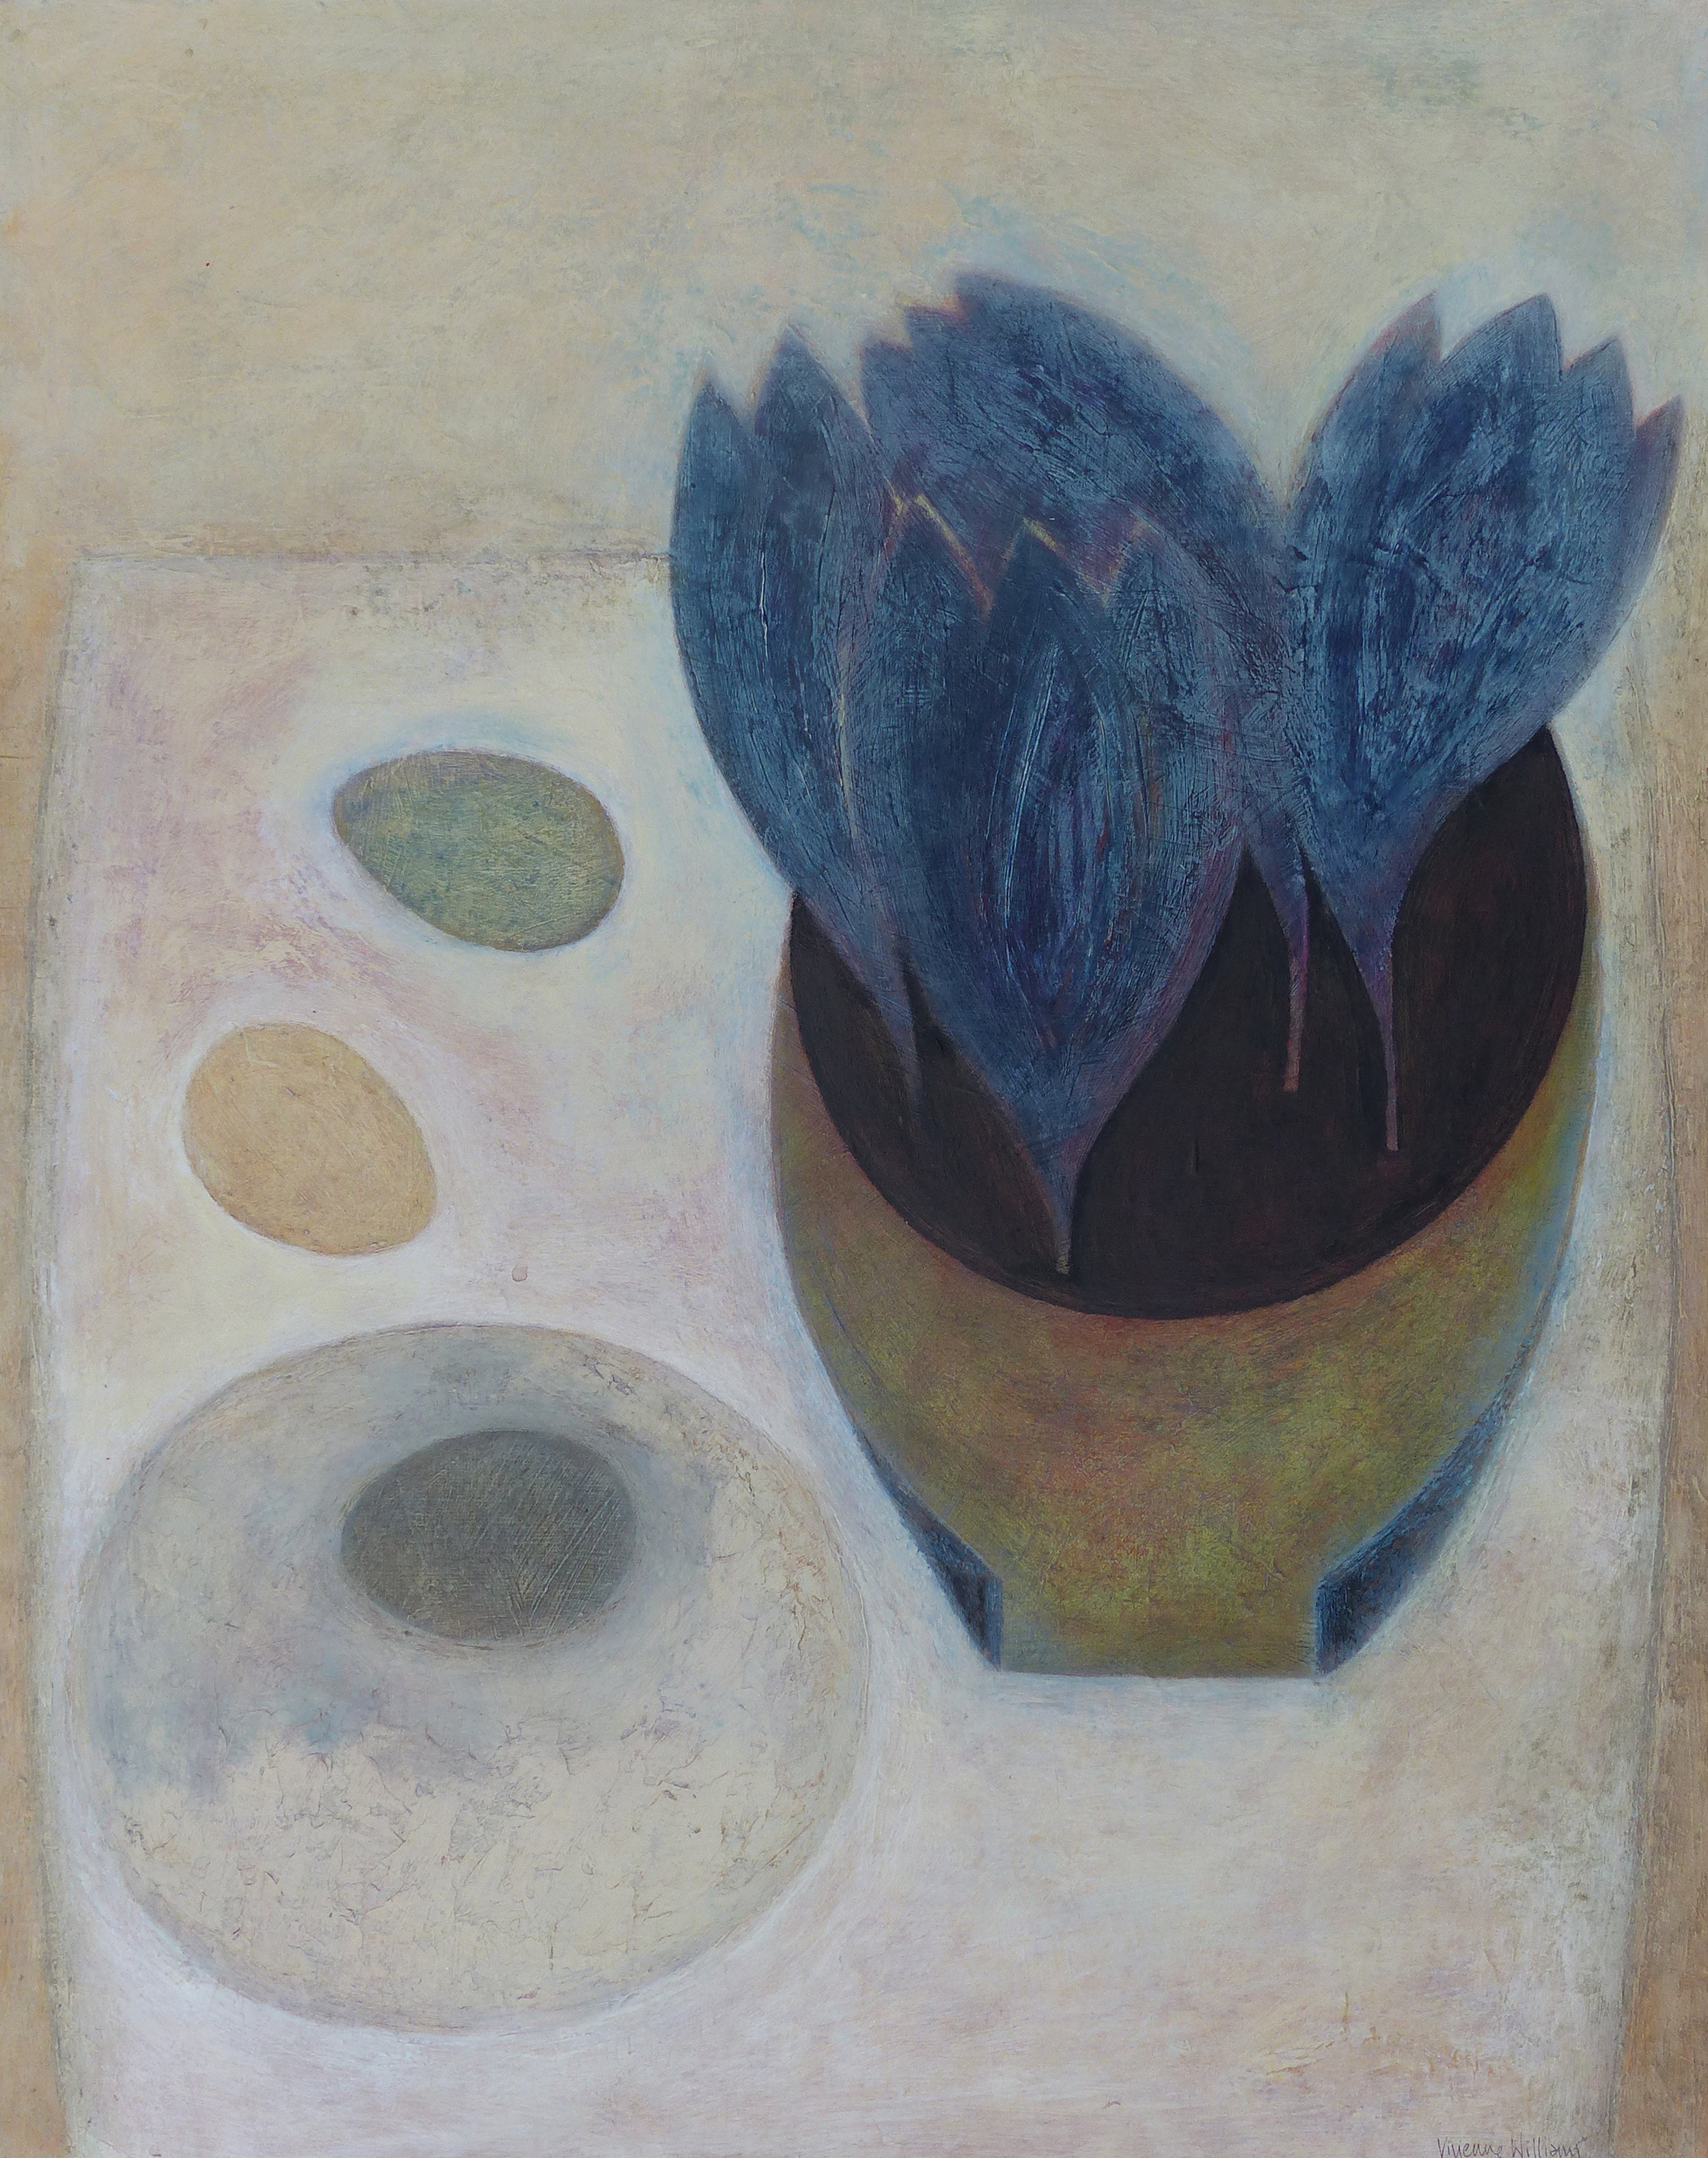 Blue Crocus with Three Eggs, 51cm x 41cm, 2016